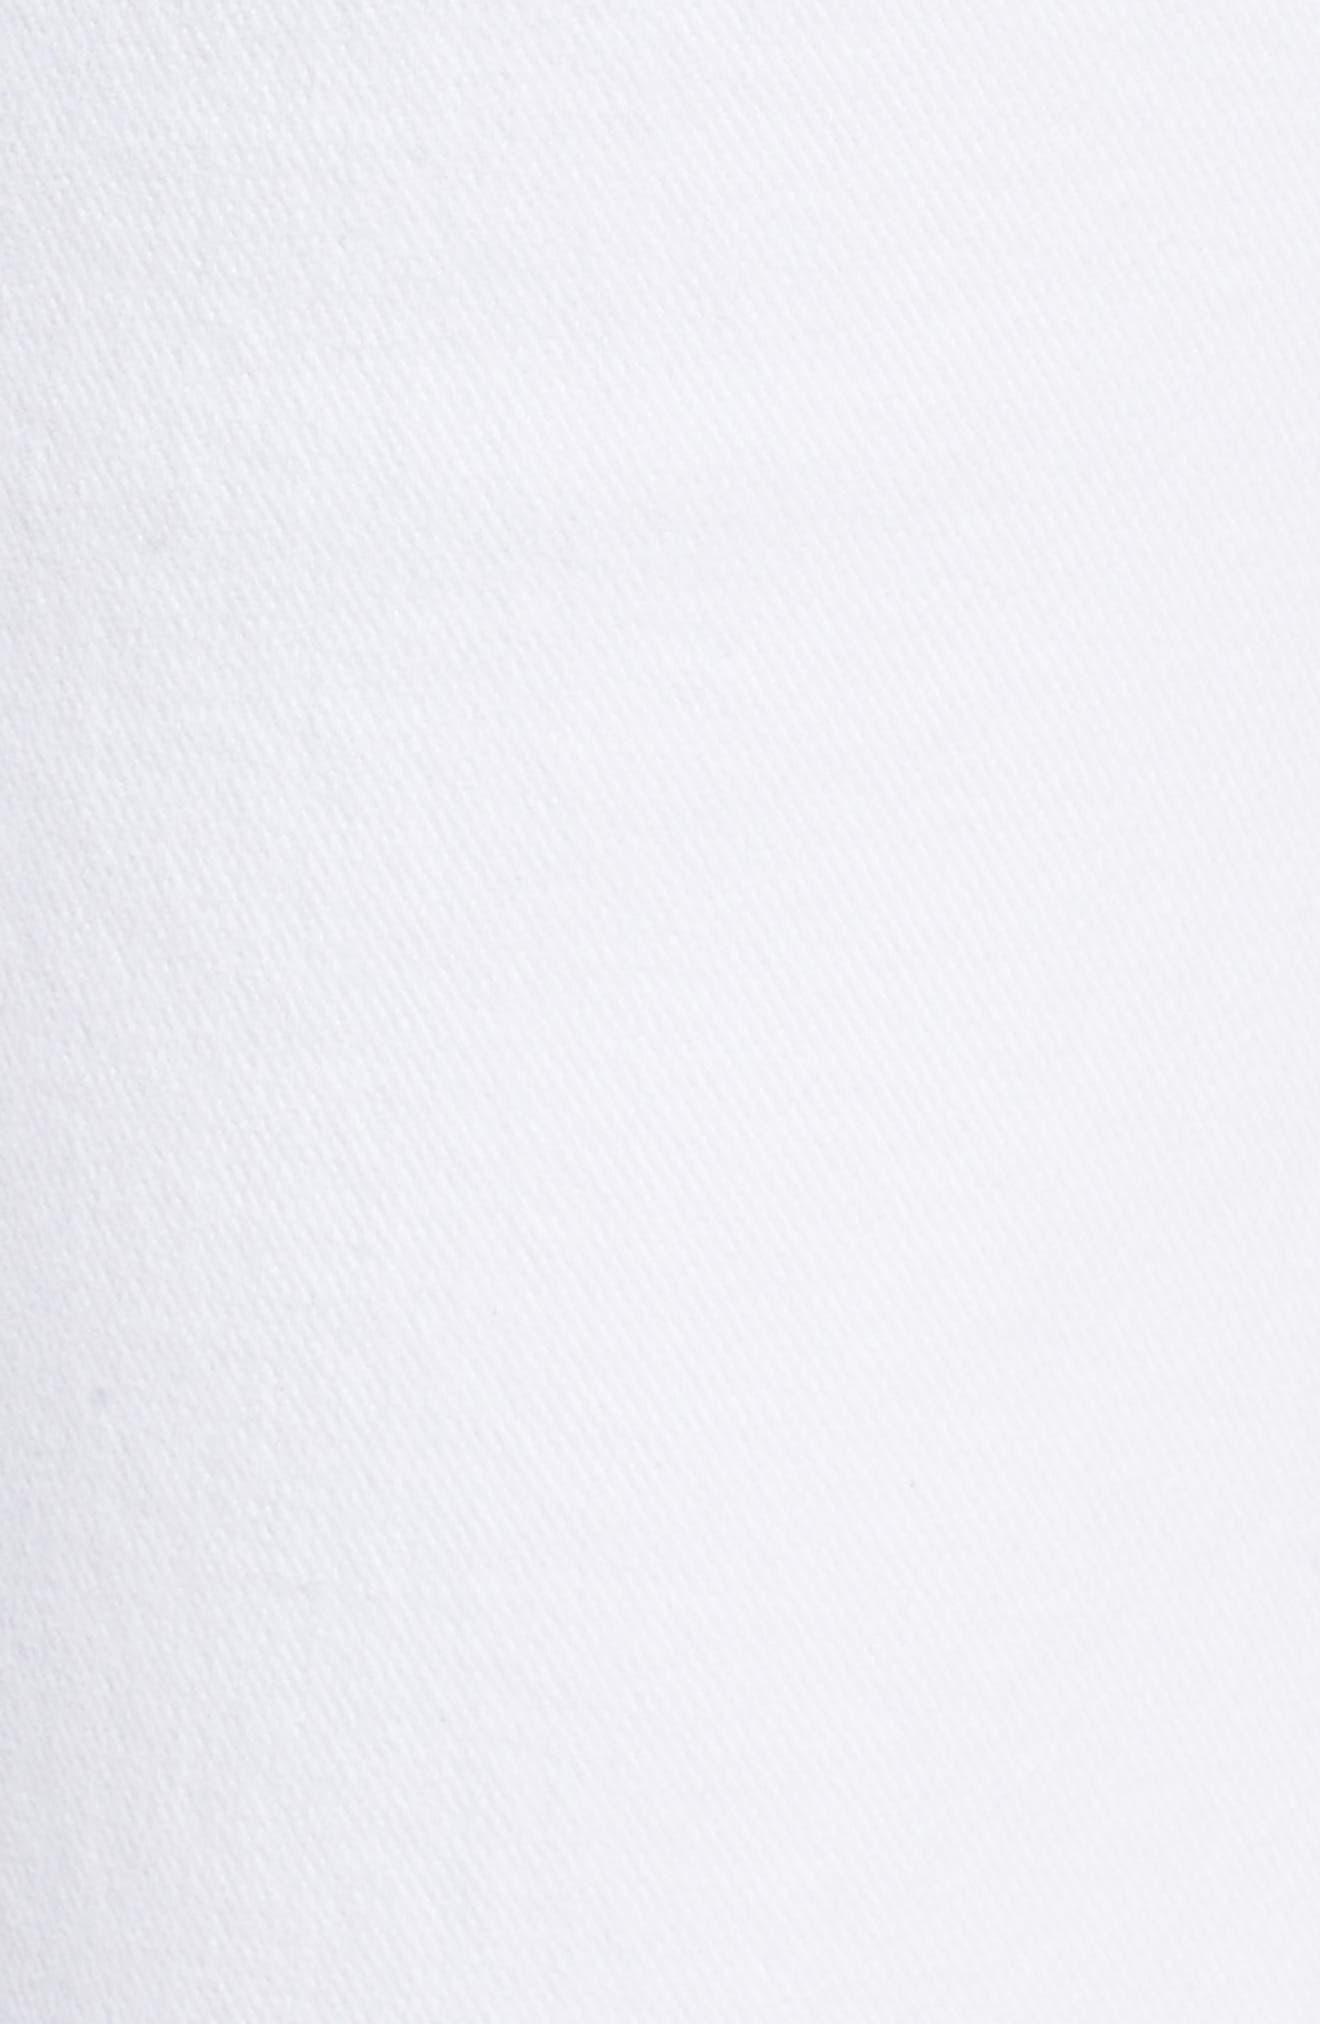 Verdugo Slanted Crop Skinny Jeans,                             Alternate thumbnail 6, color,                             CRISP WHITE